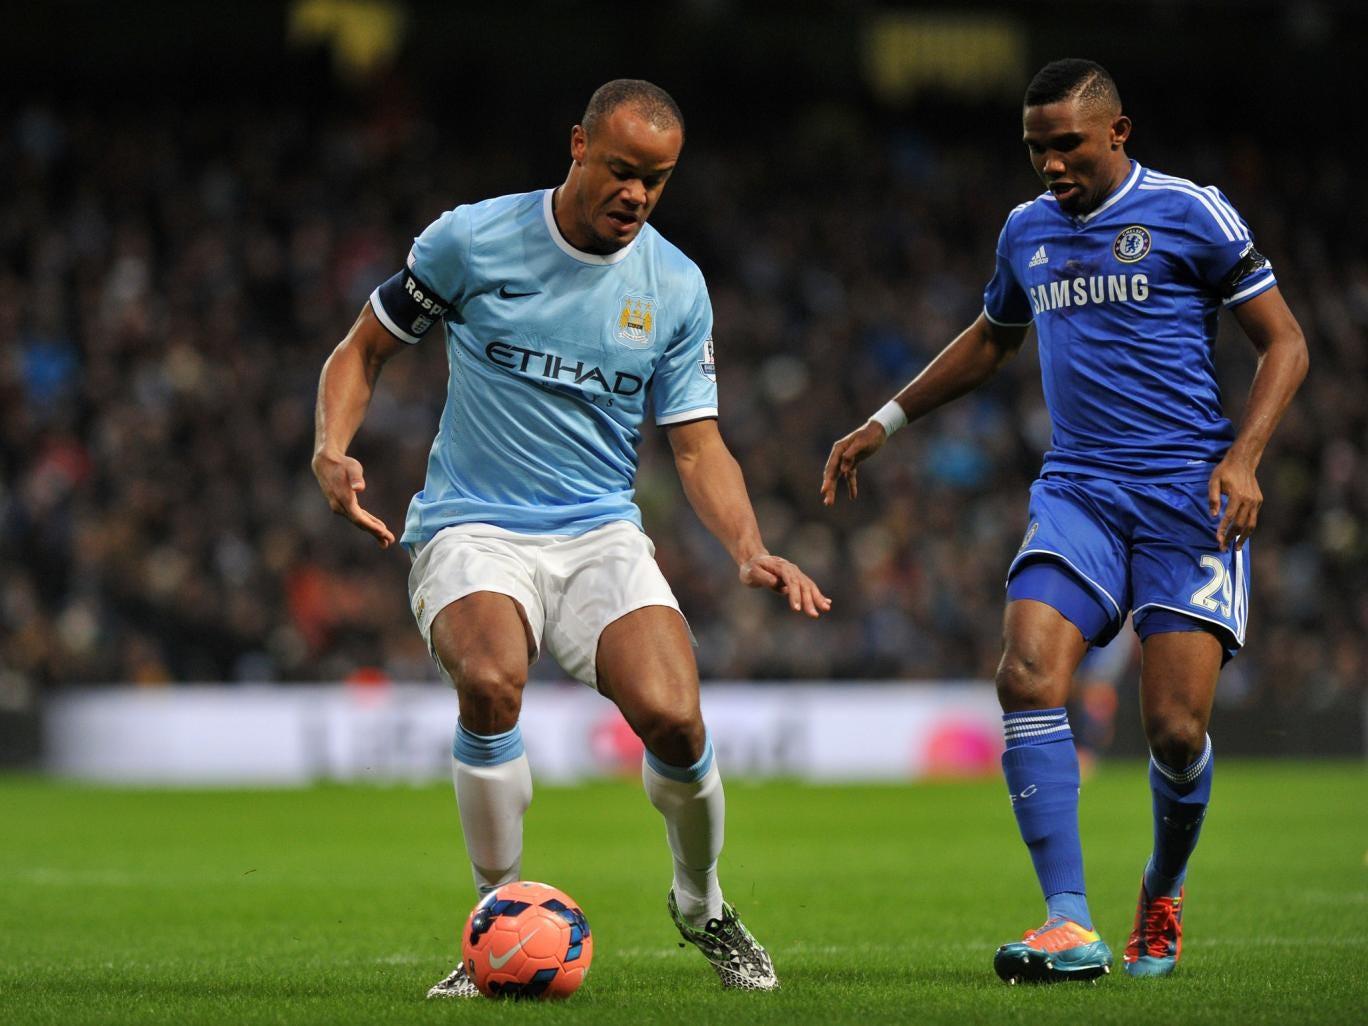 Vincent Kompany protects the ball from Chelsea striker Samuel Eto'o